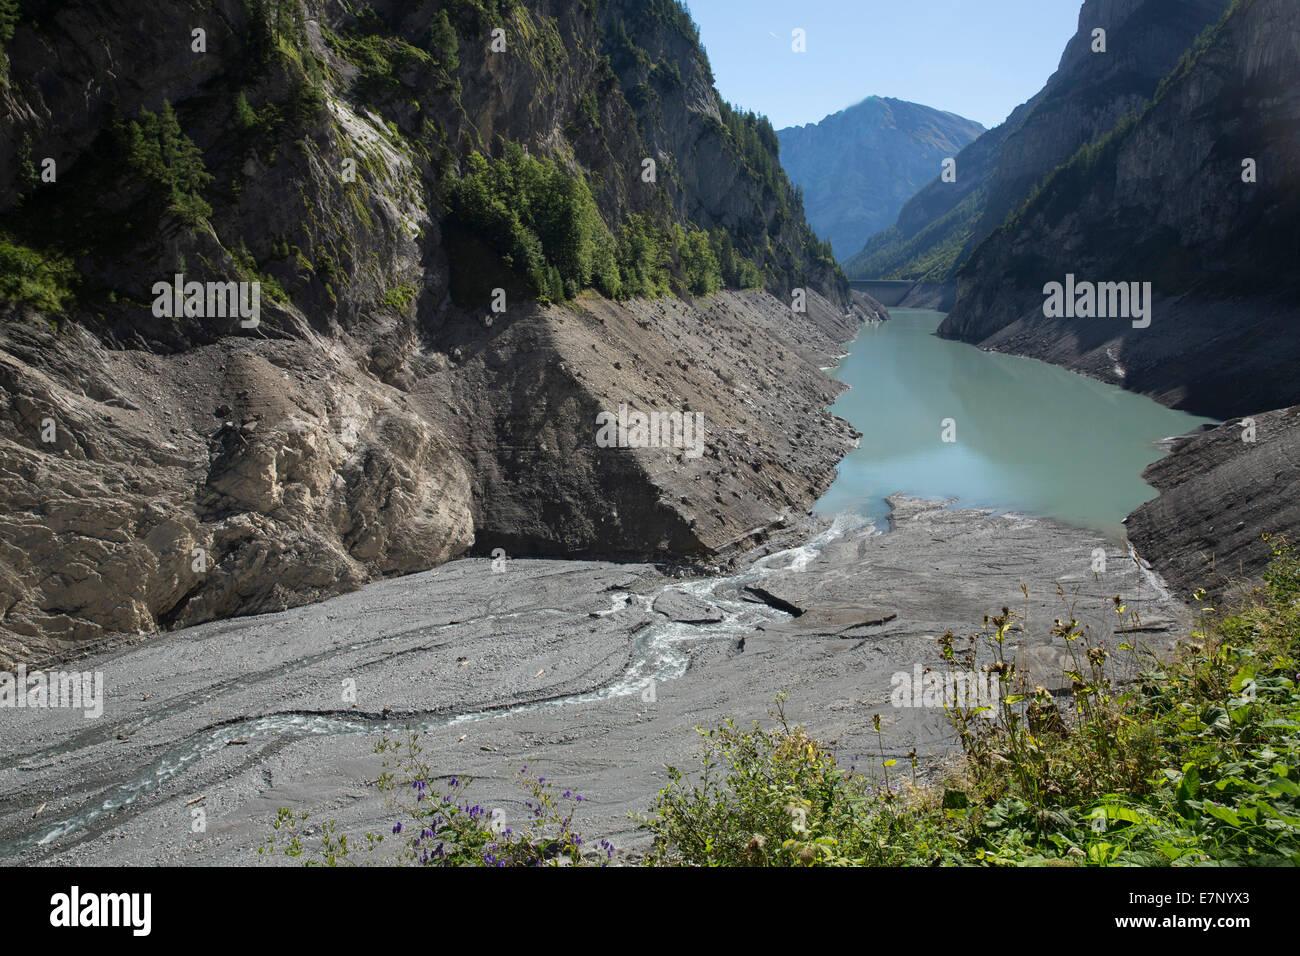 Calfeisental, depósito, vacío Gigerwald, agua, SG, en el cantón de San Gallen, energía, Suiza, Imagen De Stock